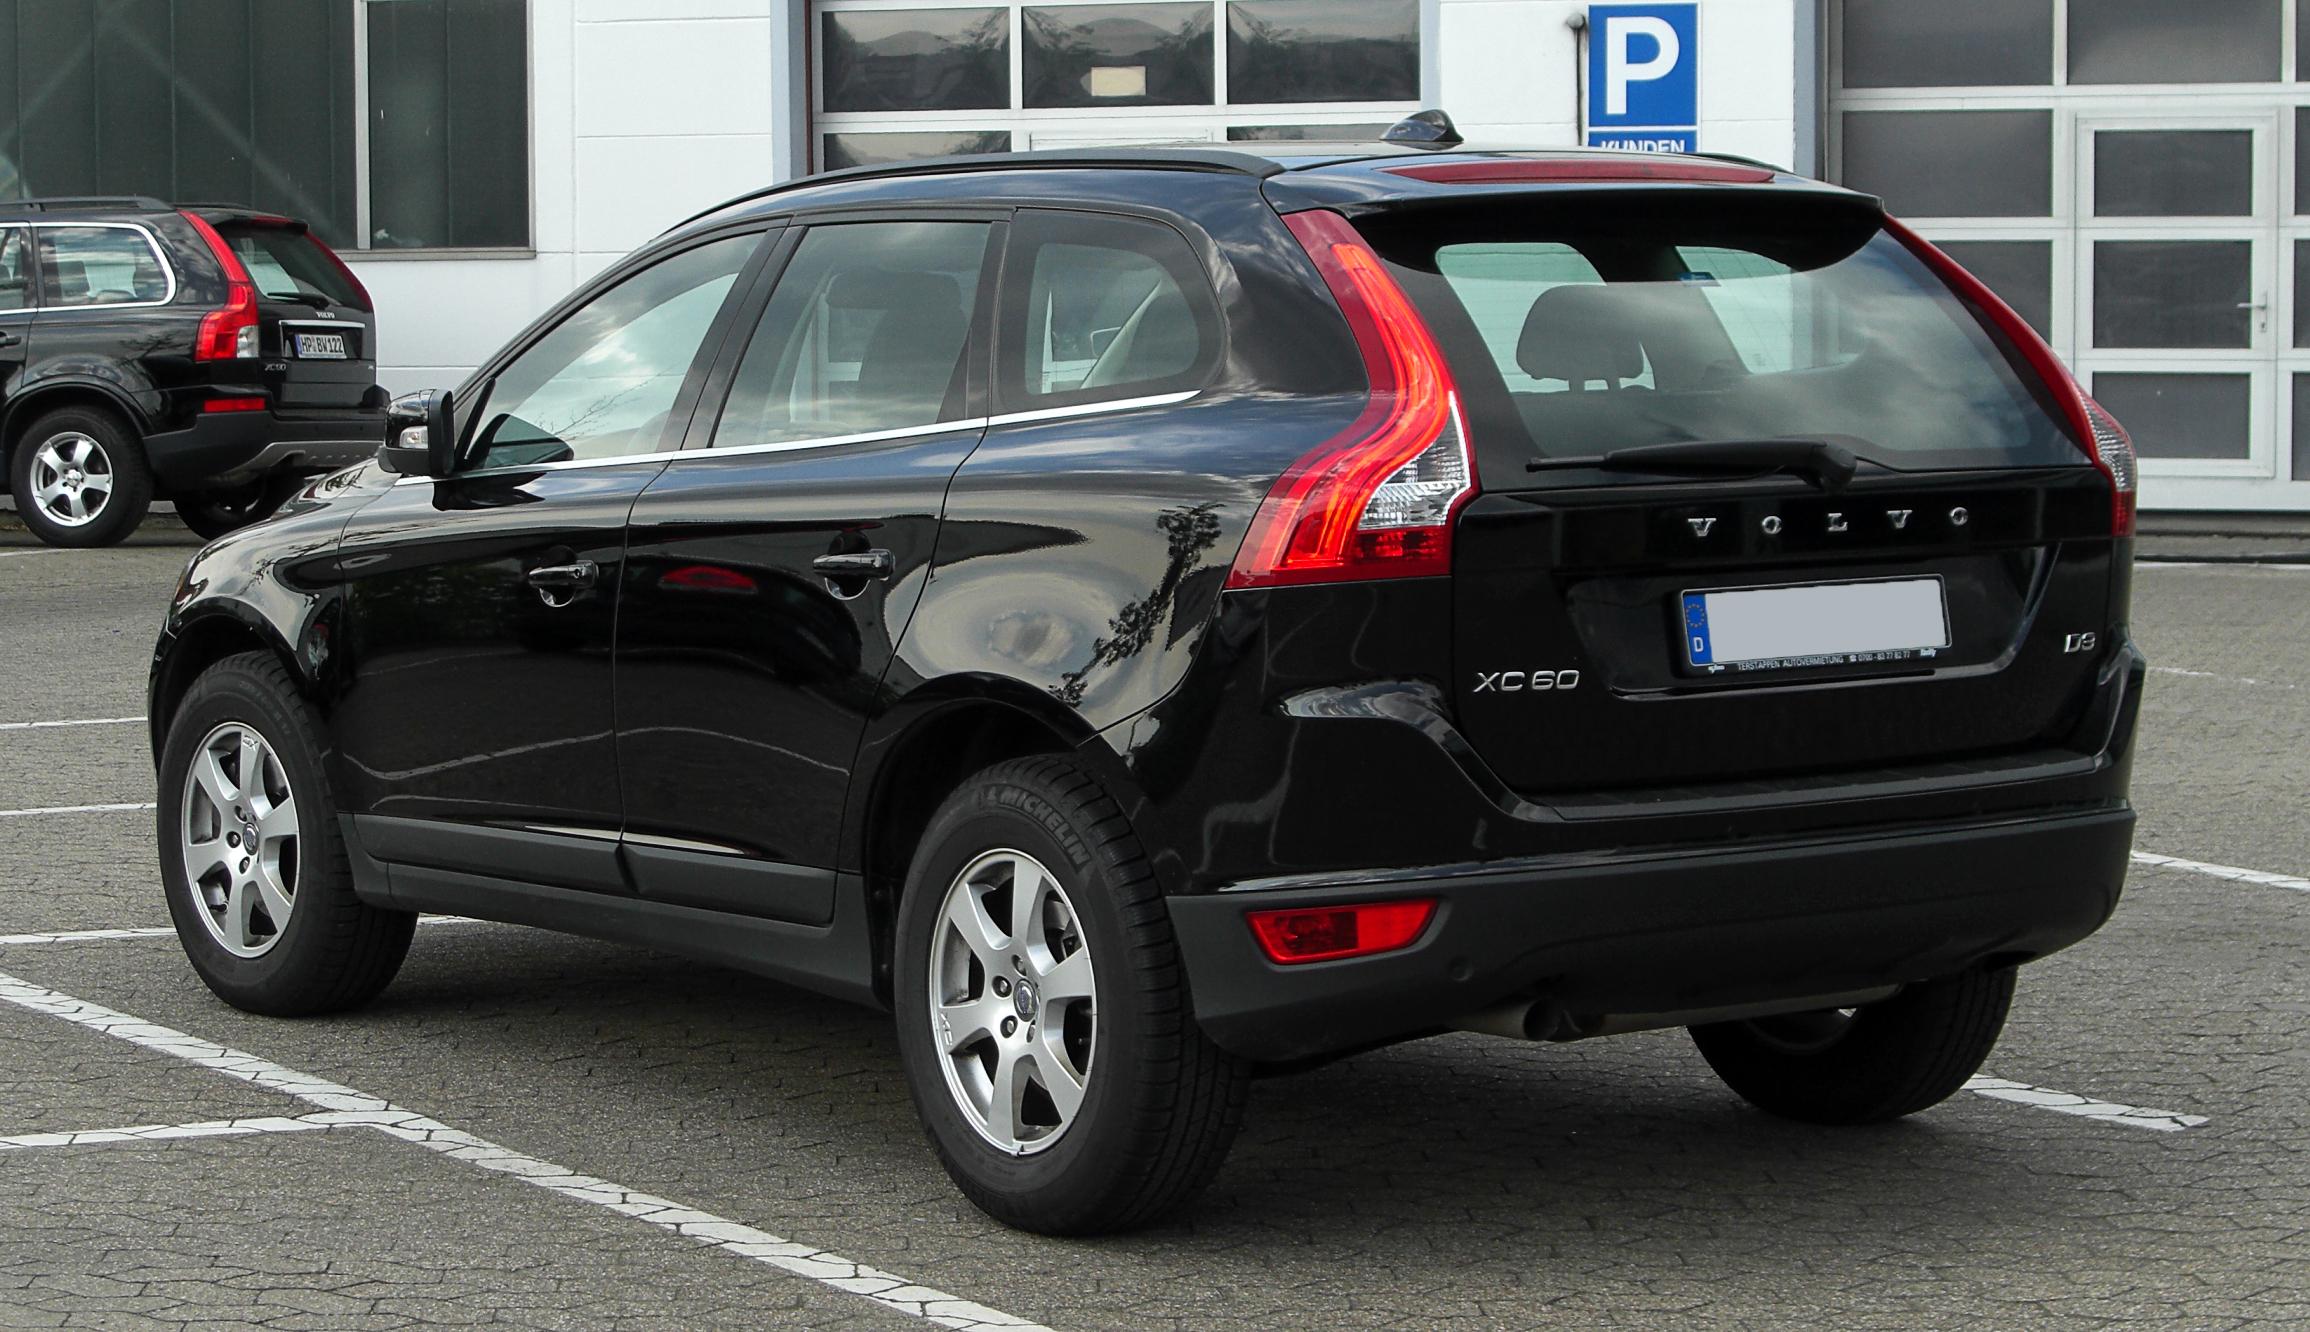 File:Volvo XC60 D3 – Heckansicht, 16. April 2011, Hilden.jpg - Wikimedia Commons